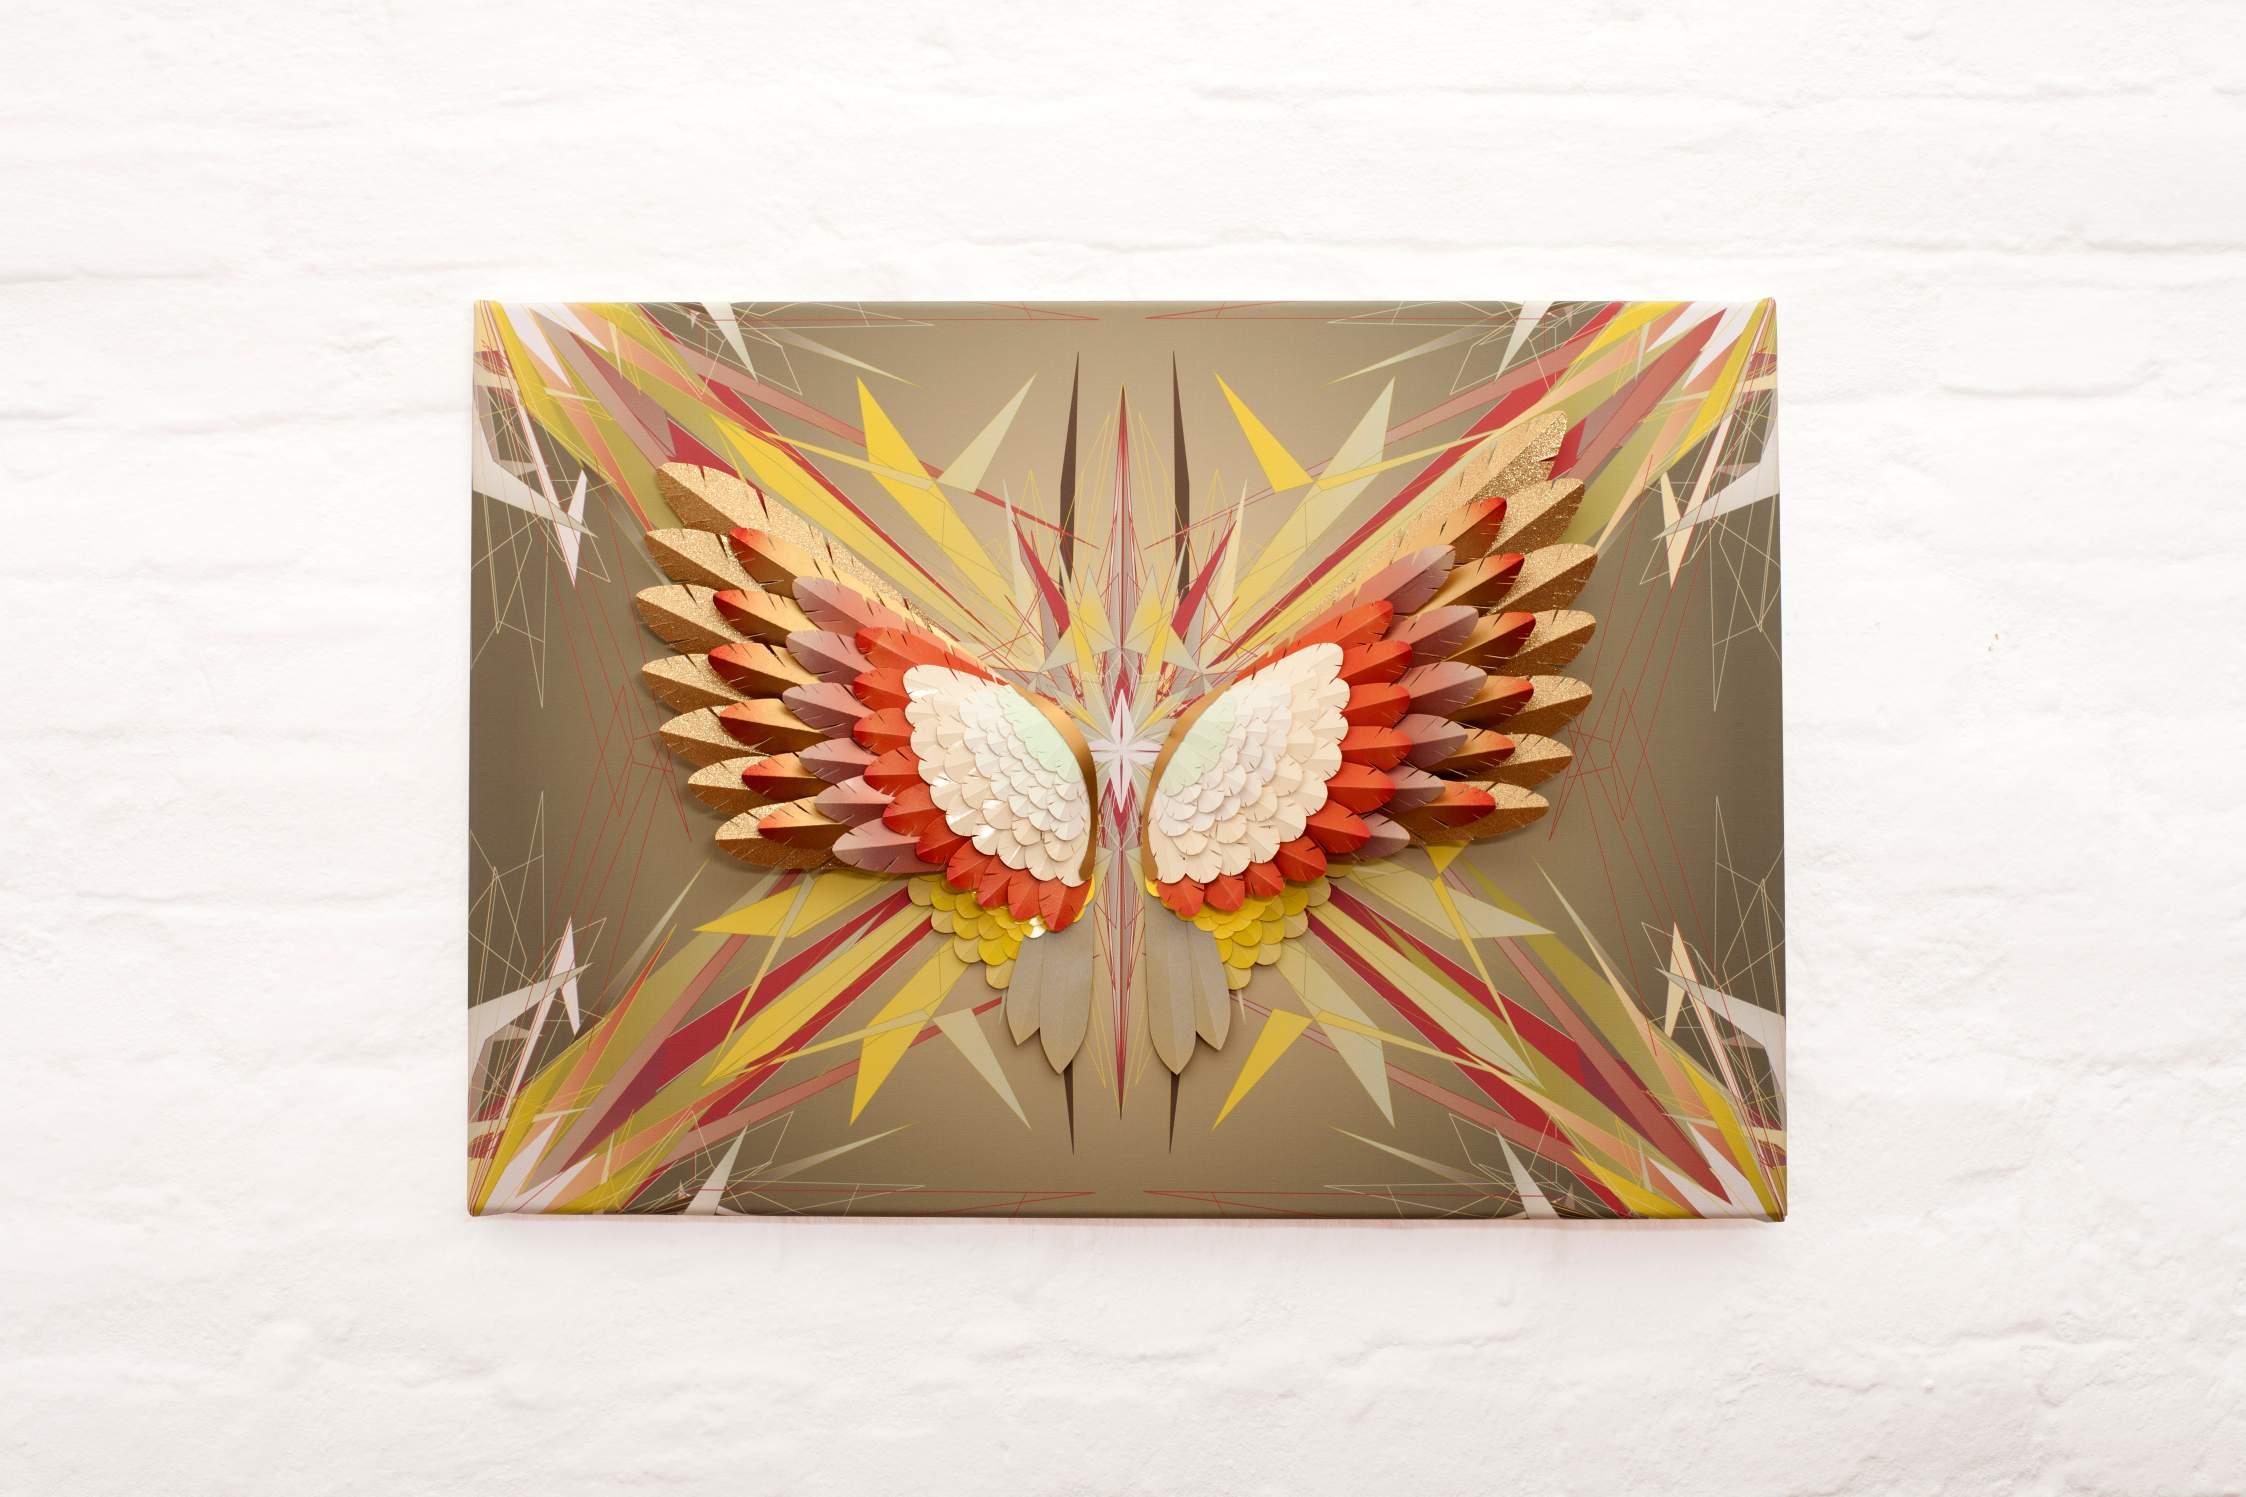 Gold Fire Pheonix, Plate #3